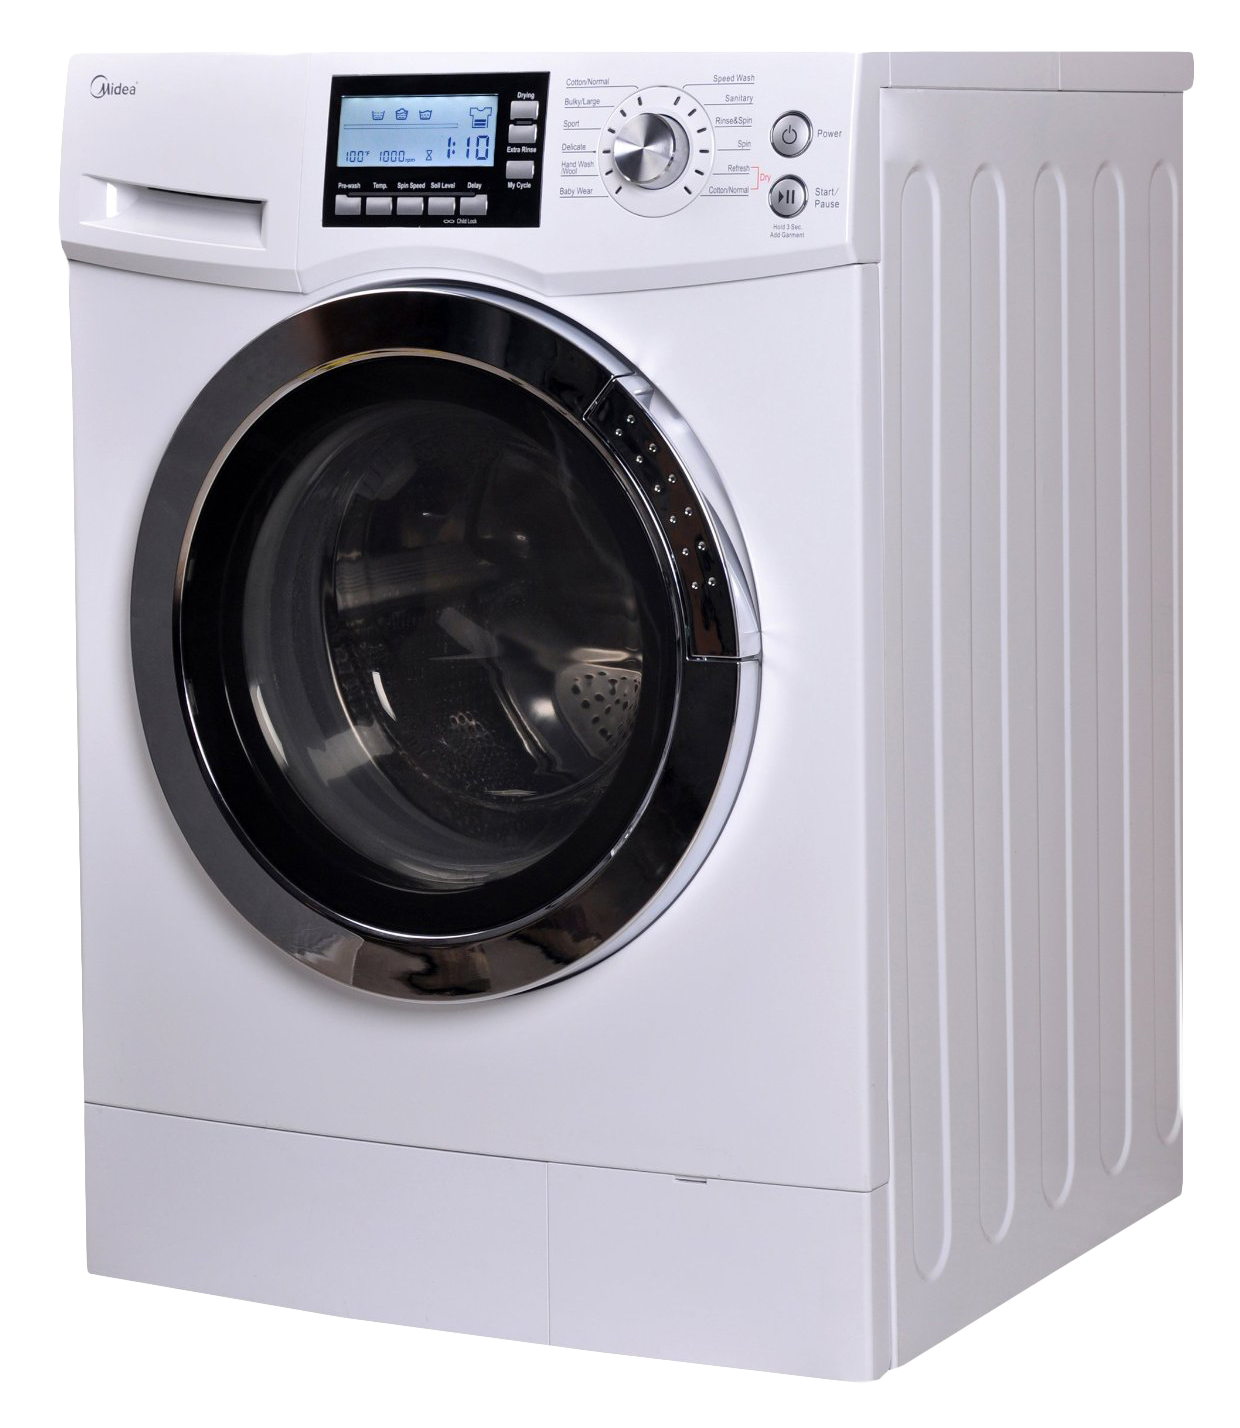 Front Loading Washing Machine PNG Image